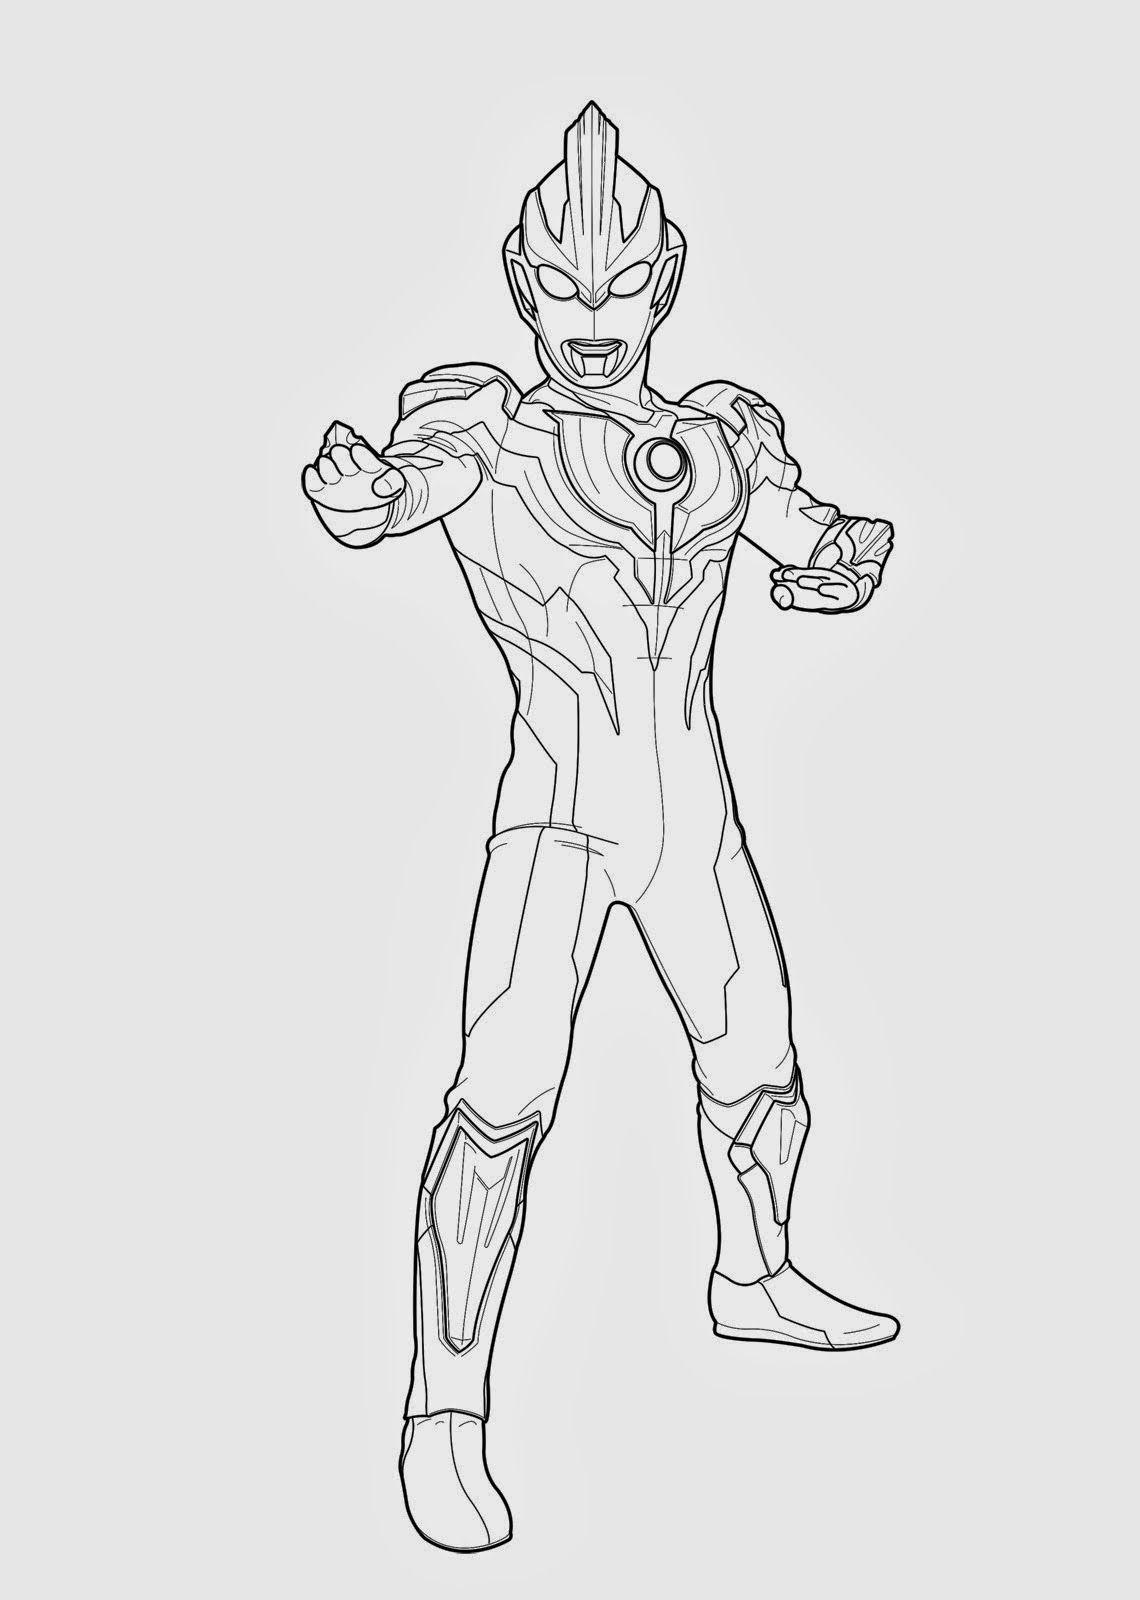 Ahmedatheism Gambar Mewarnai Ultraman Orb Petir